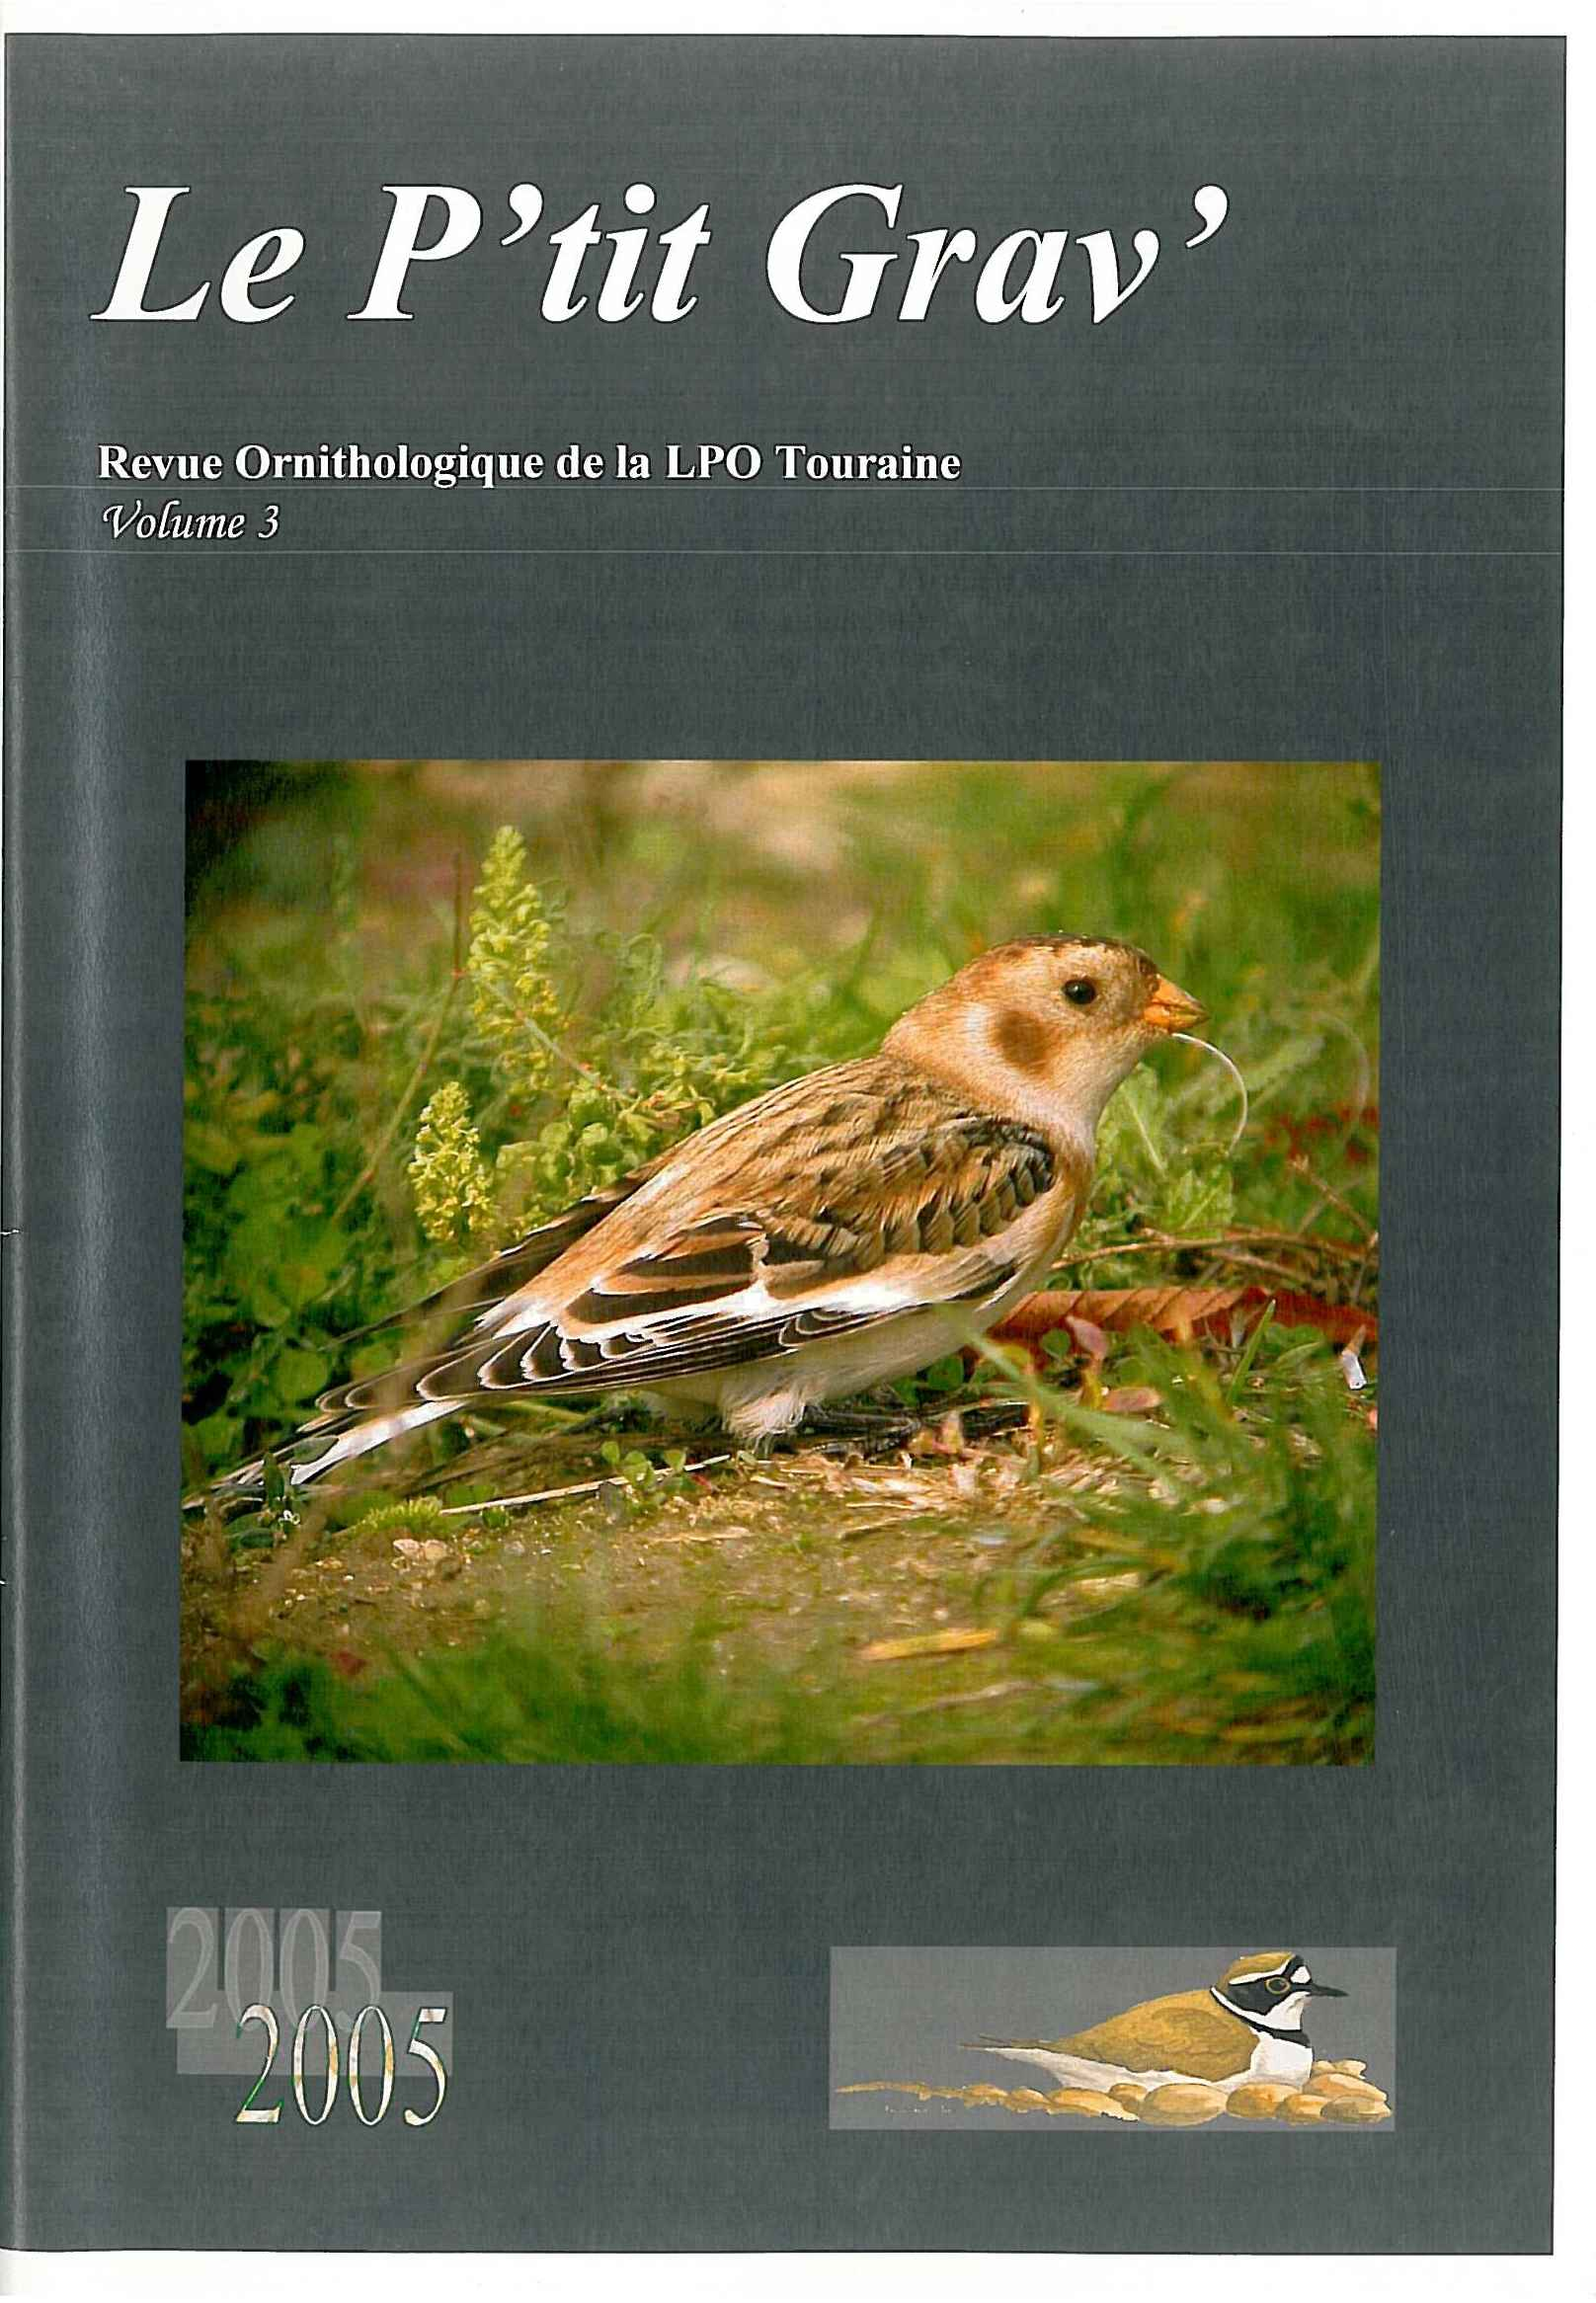 https://cdnfiles2.biolovision.net/www.faune-touraine.org/userfiles/MonDossier/PtitGravvol3.jpg